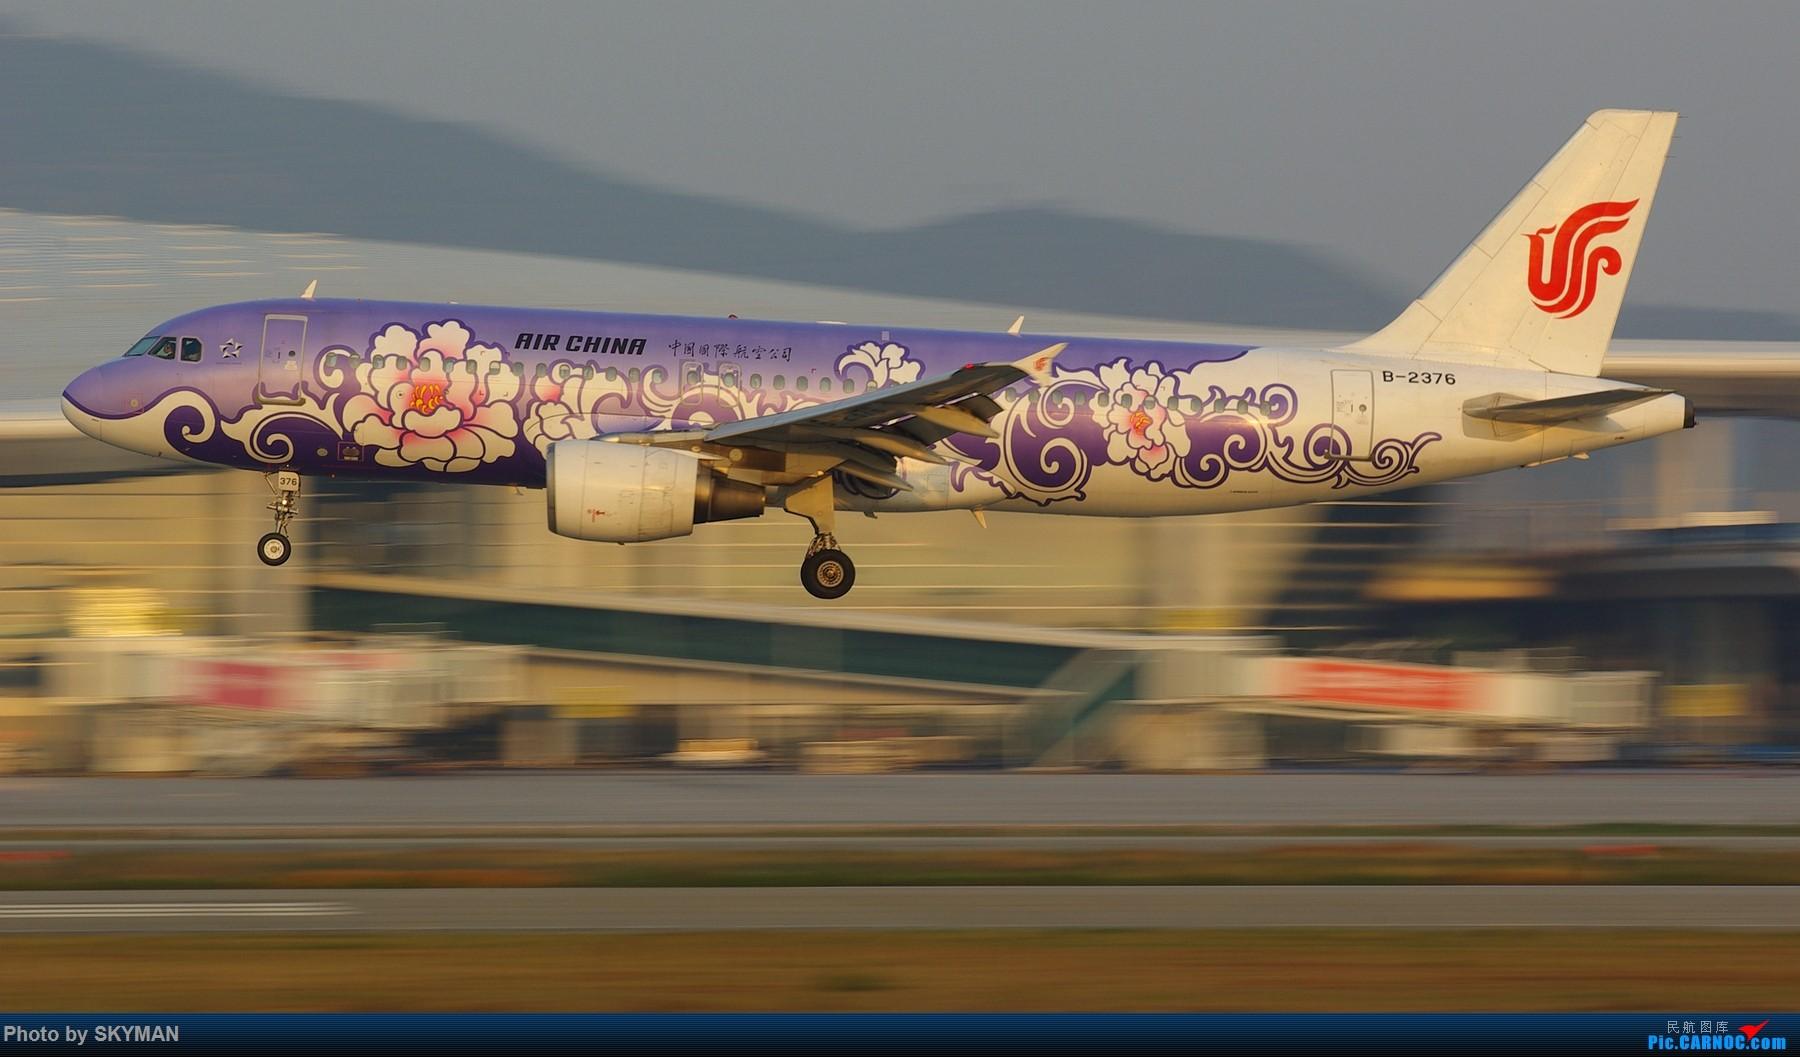 Re:[原创]BLDDQ---内痕么 以目前的形式靠打工实在是揭不开锅了 各位爷列为亲看着意思点啊 别控制 可是今天下午刚出炉的 绝对新鲜热乎 AIRBUS A320-200 B-2376 中国深圳宝安国际机场